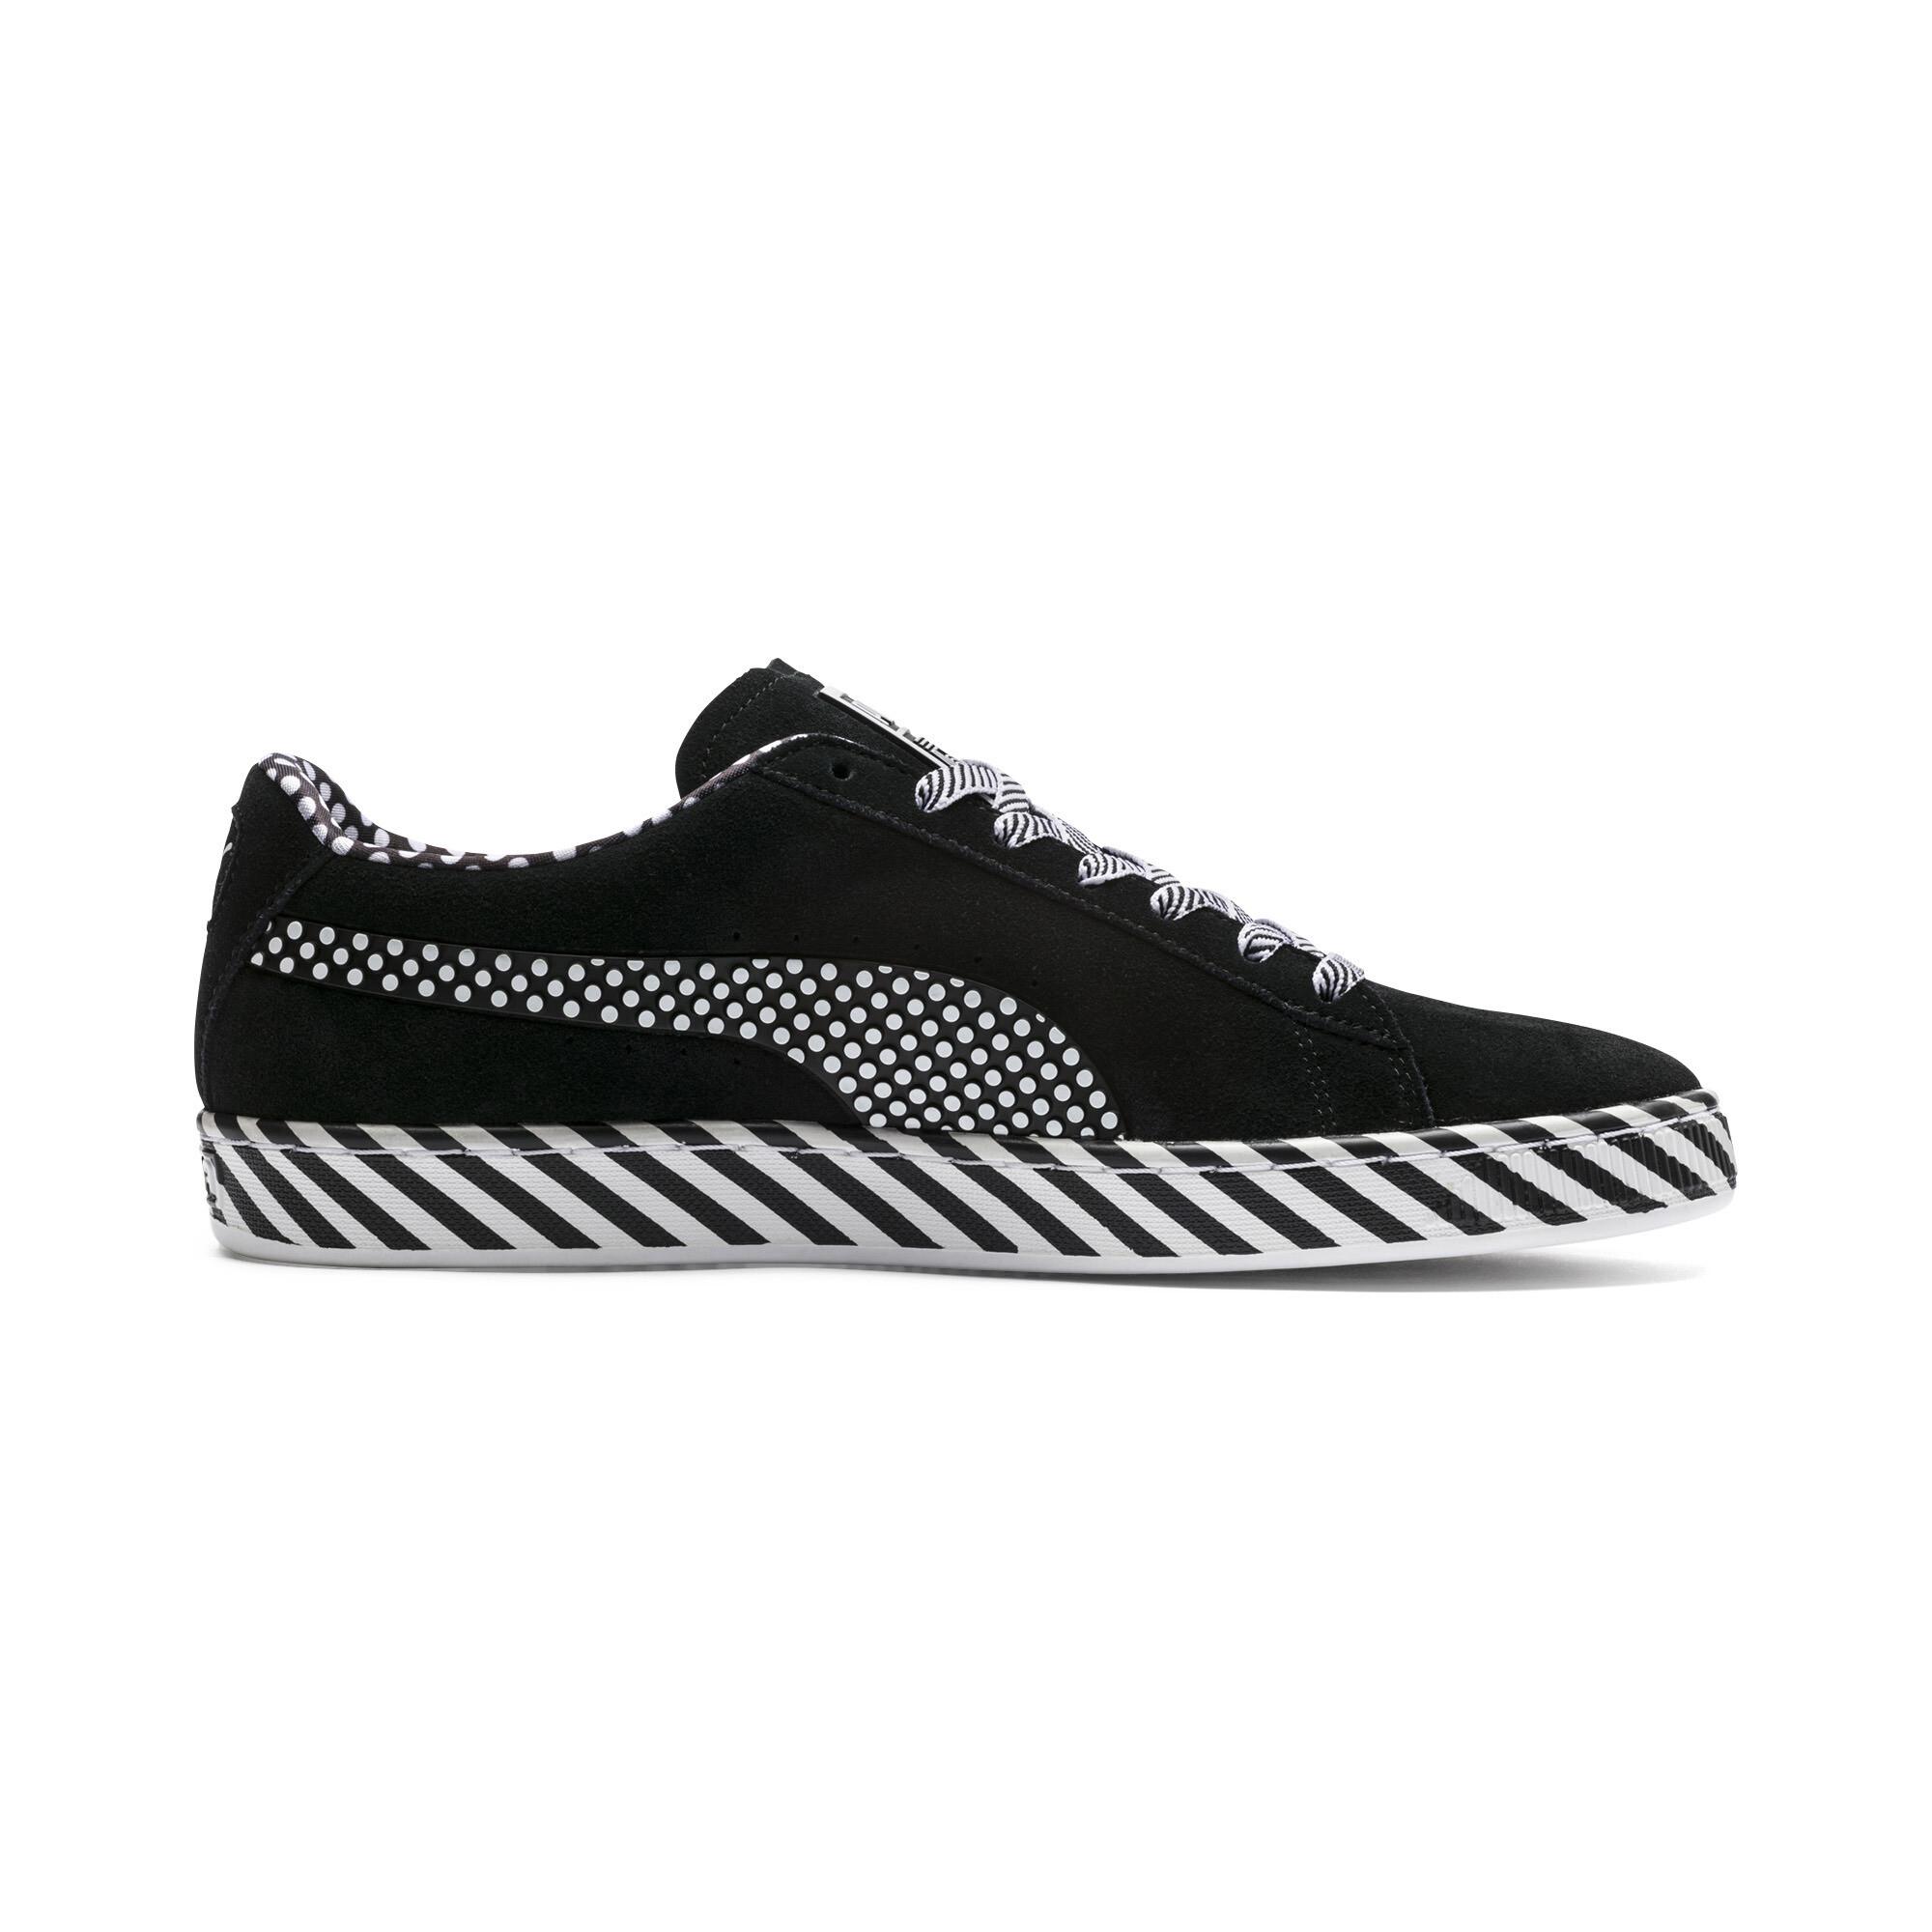 Image Puma Suede Classic Pop Culture Sneakers #5